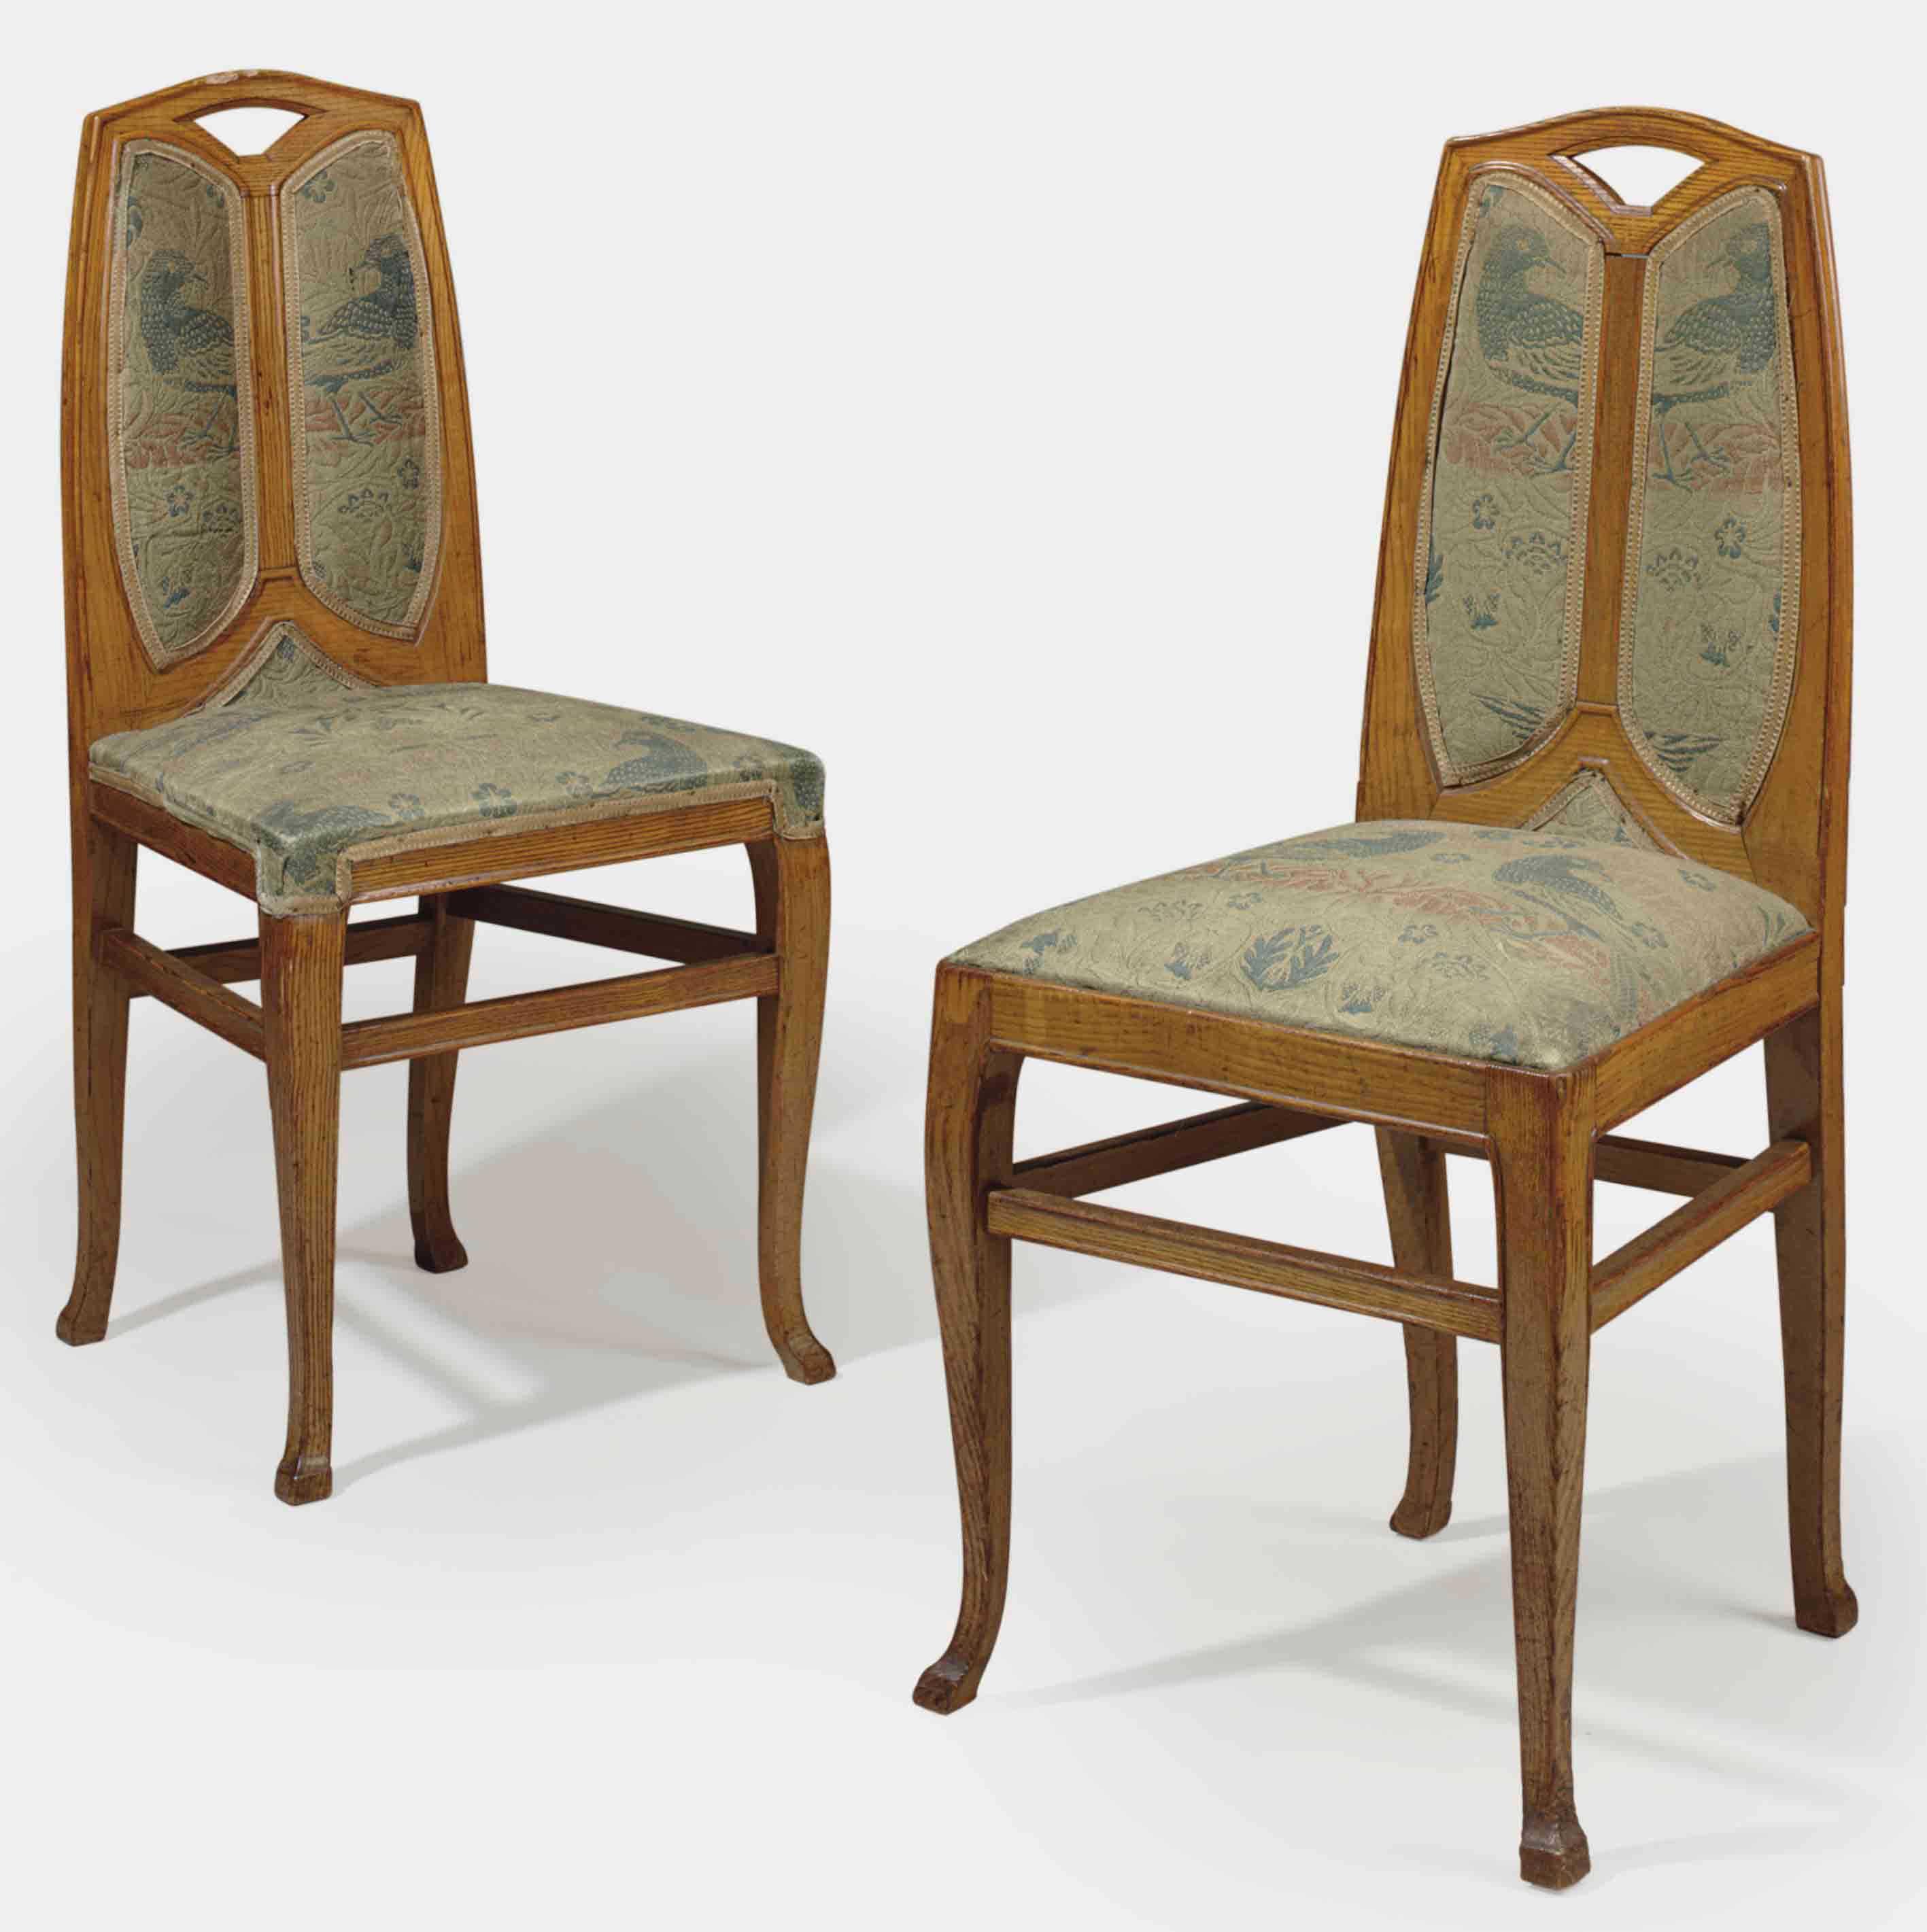 henry van de velde 1863 1957 a pair of upholstered oak side chairs circa 1903 christie 39 s. Black Bedroom Furniture Sets. Home Design Ideas